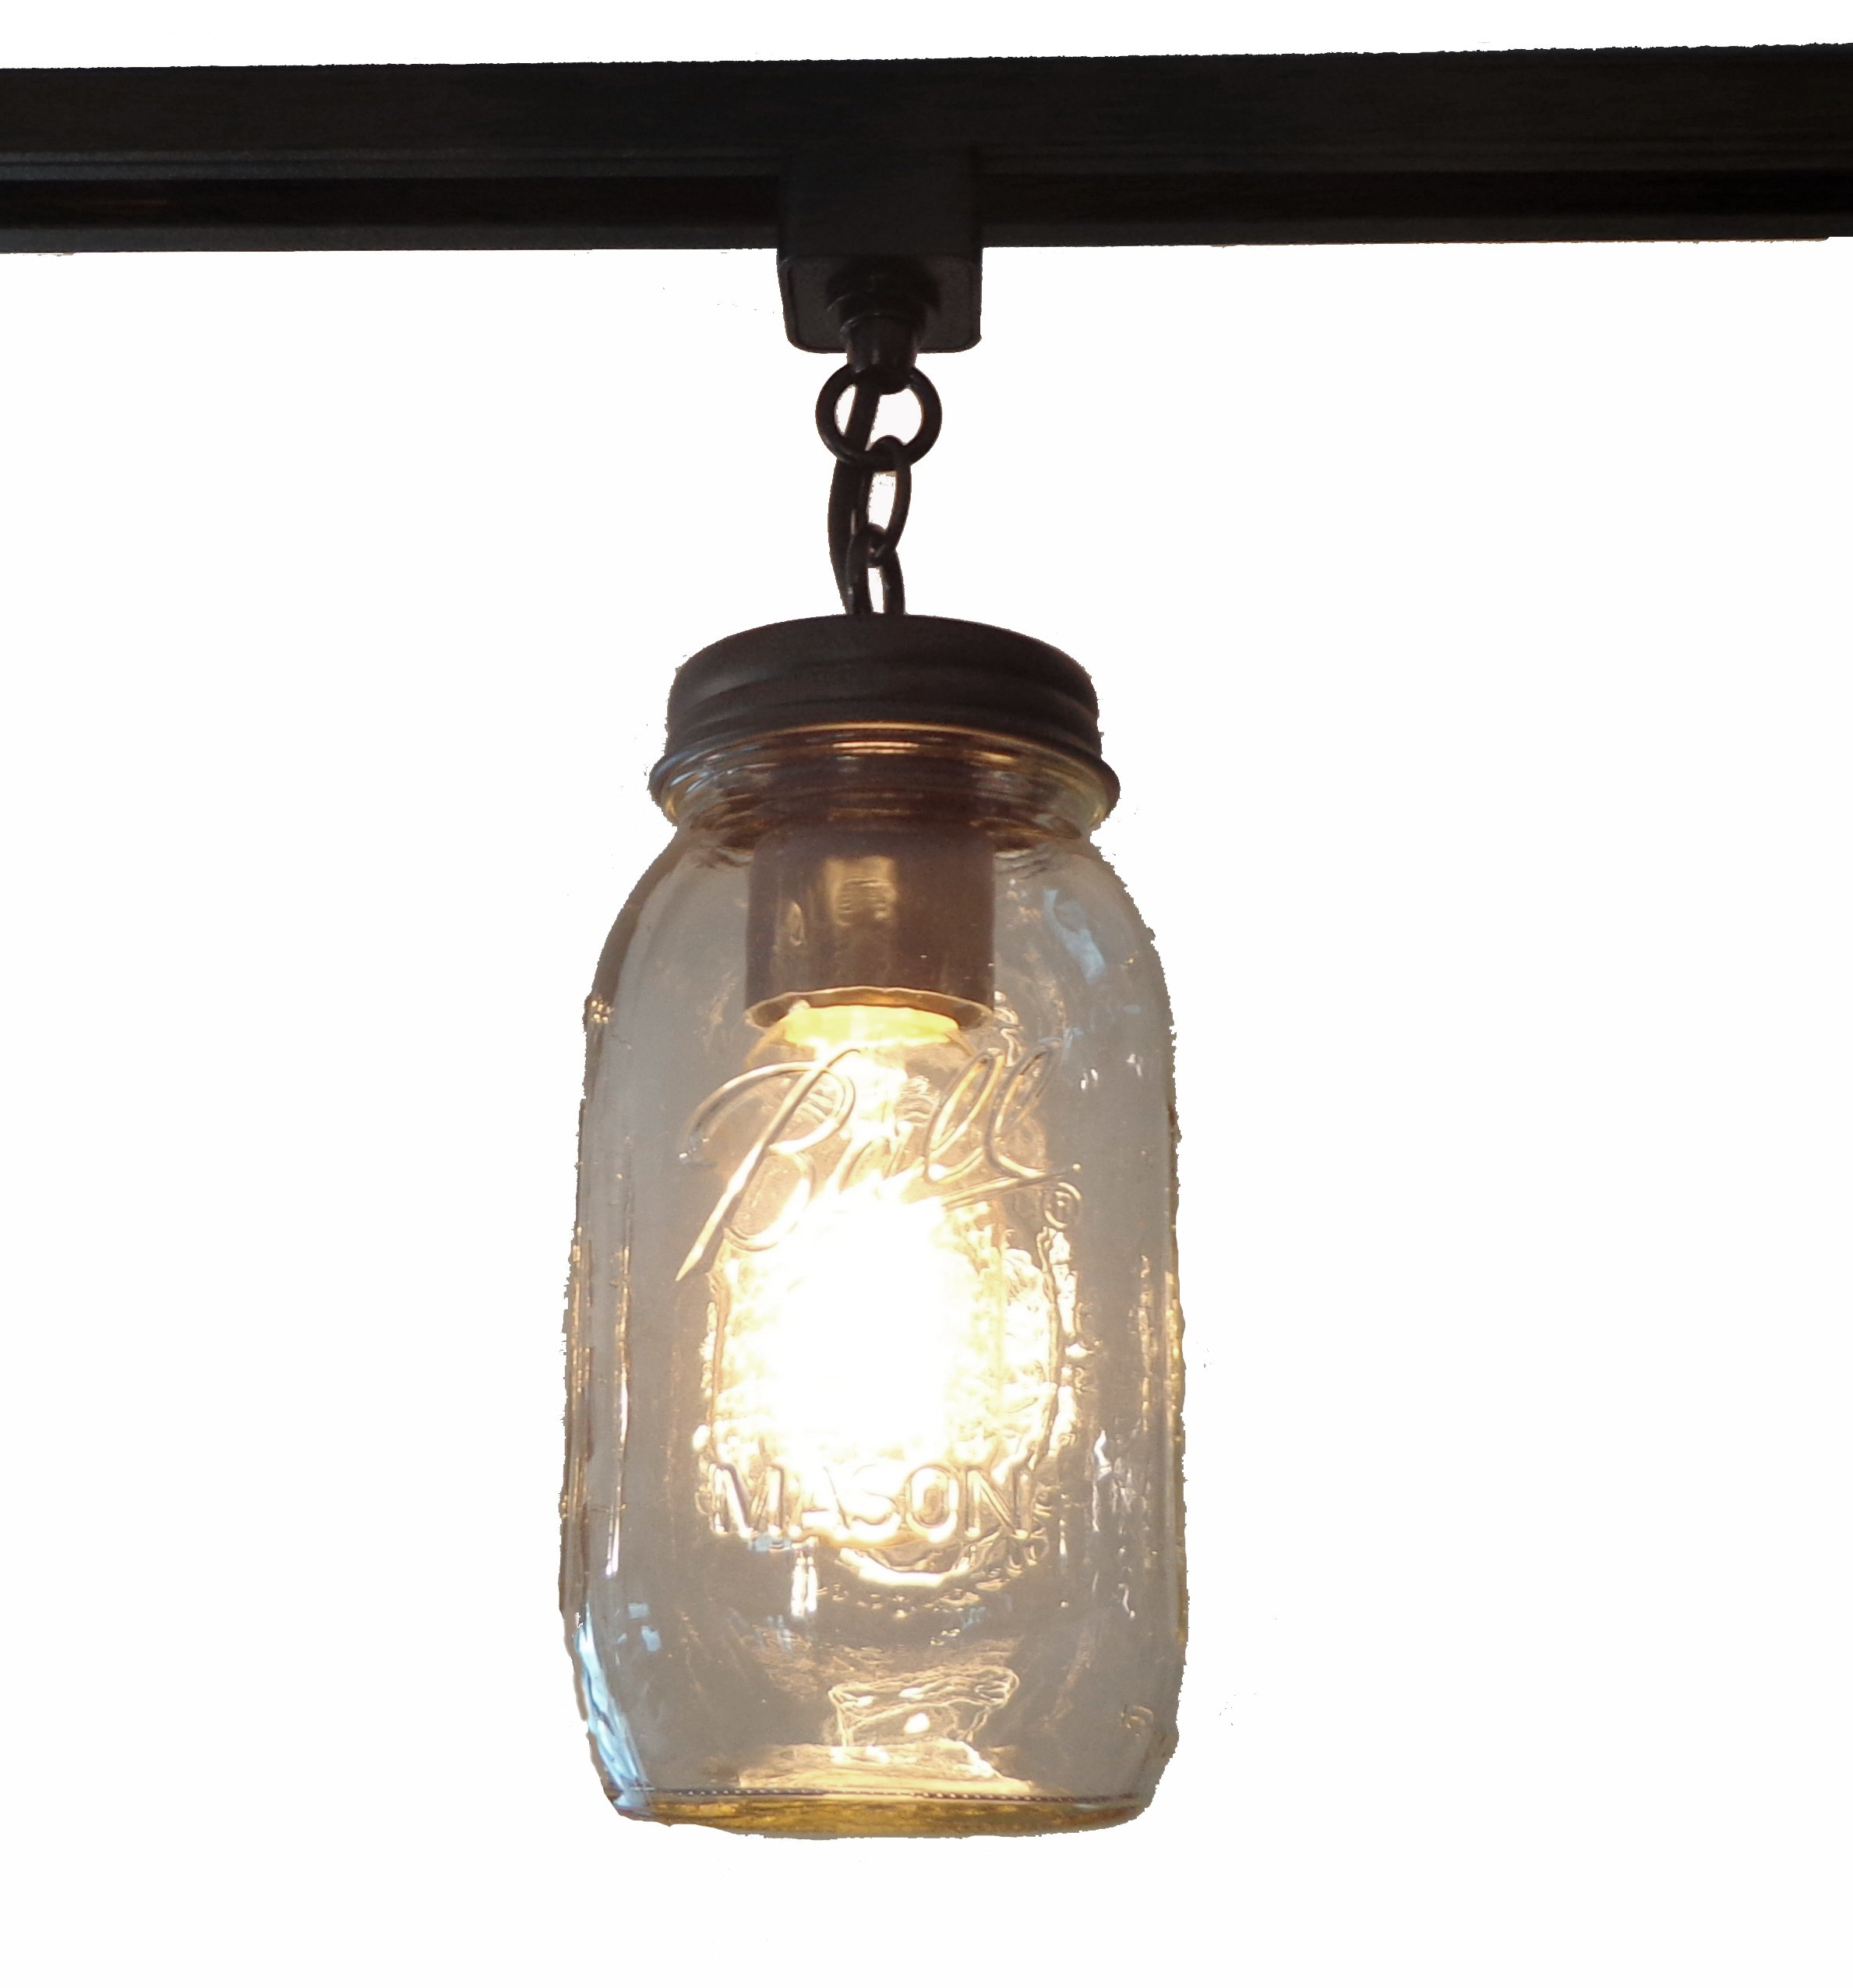 LAMP GOODS MASON JAR TRACK LIGHTING NEW QUART SINGLE by The Lamp Goods